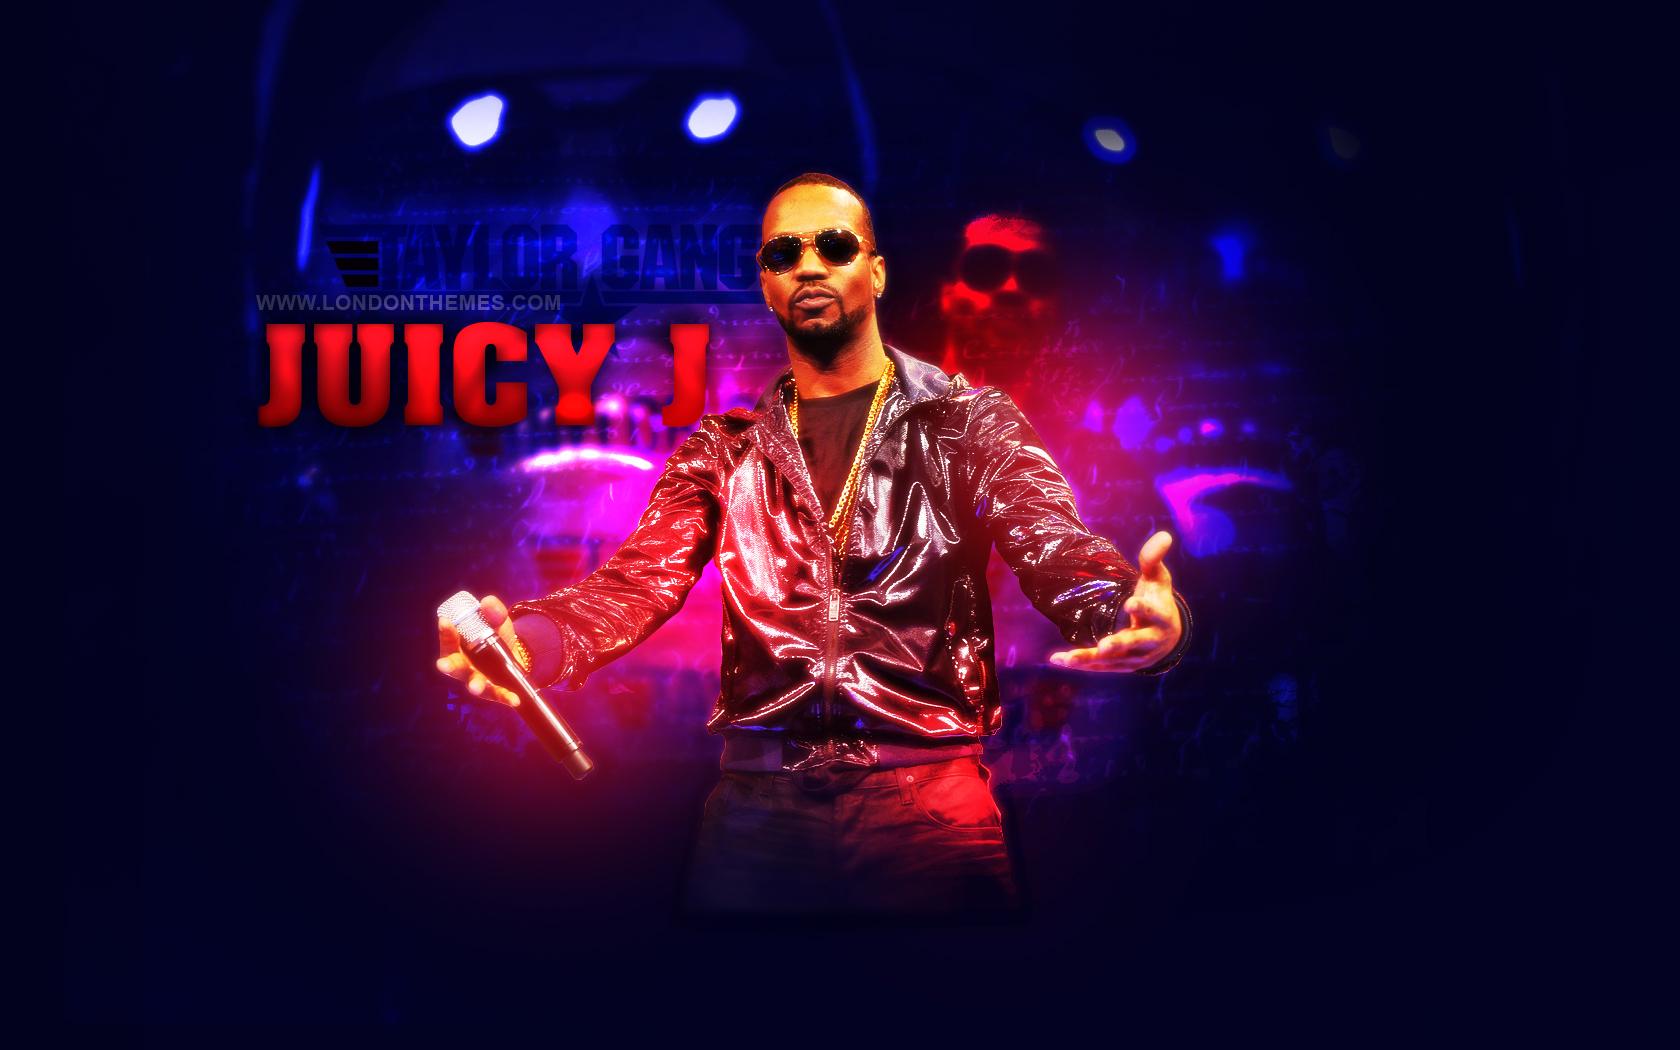 Juicy j wallpaper